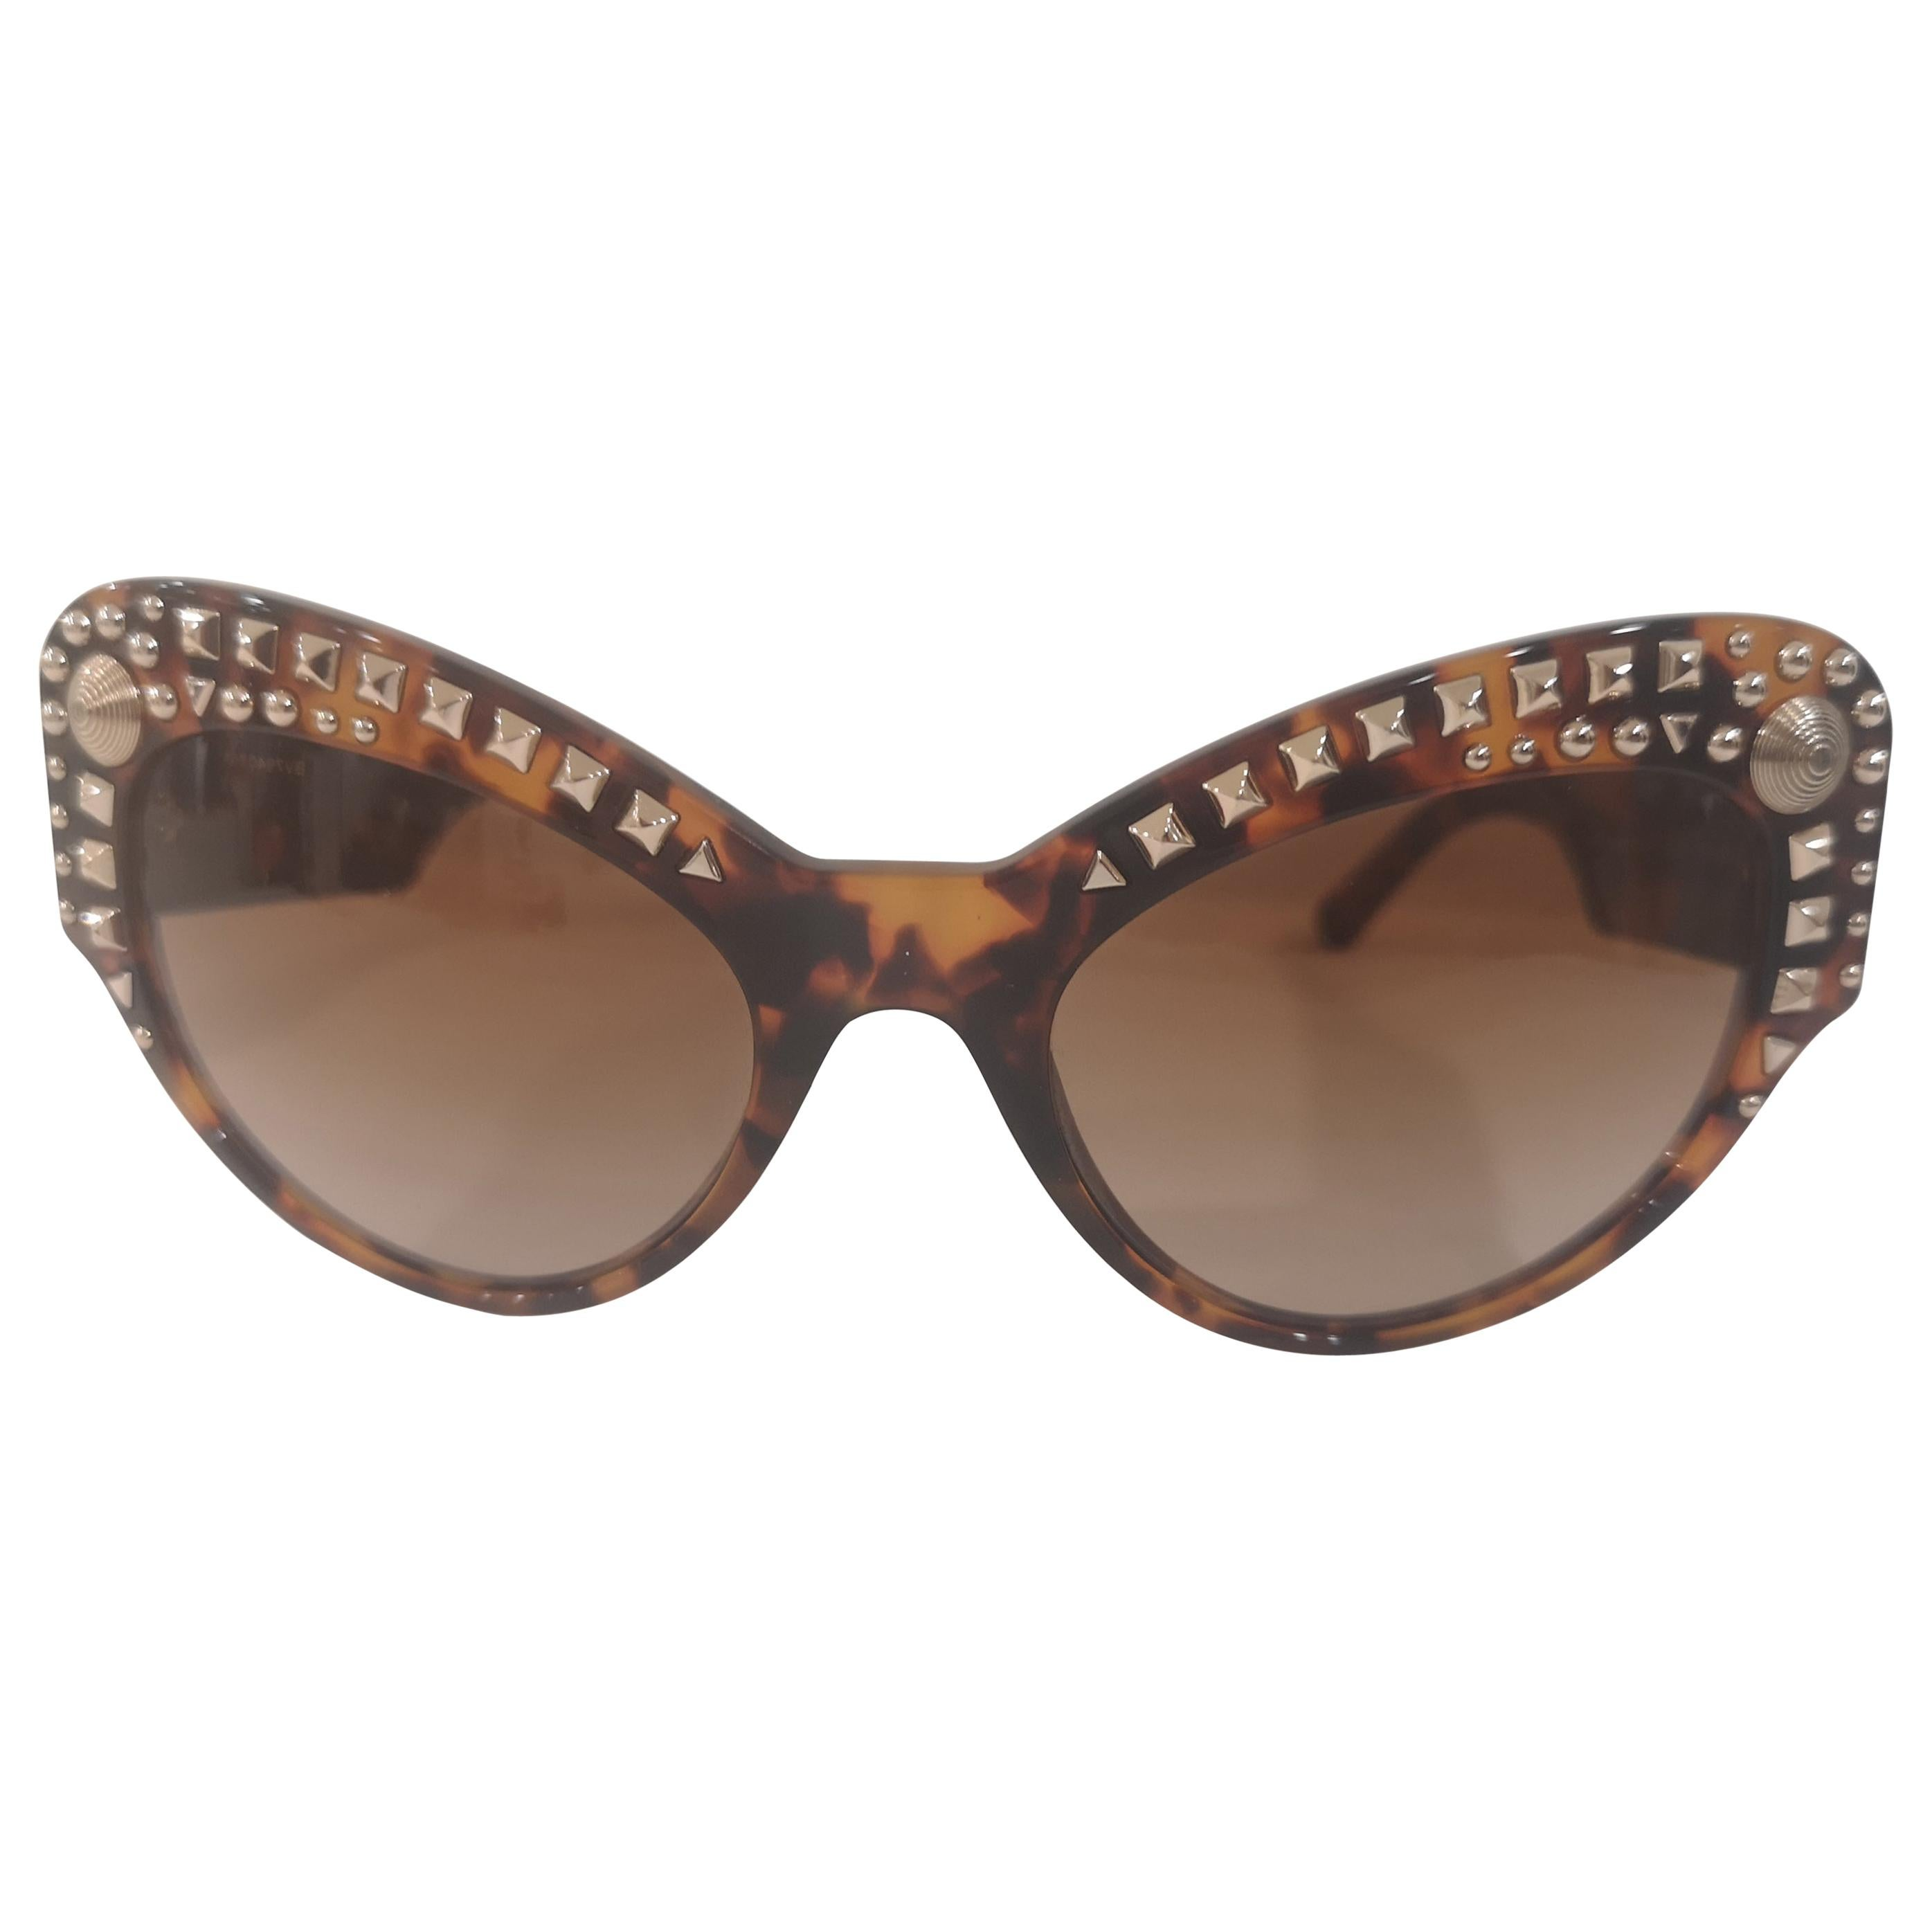 Versace tortoise gold studs Sunglasses NWOT